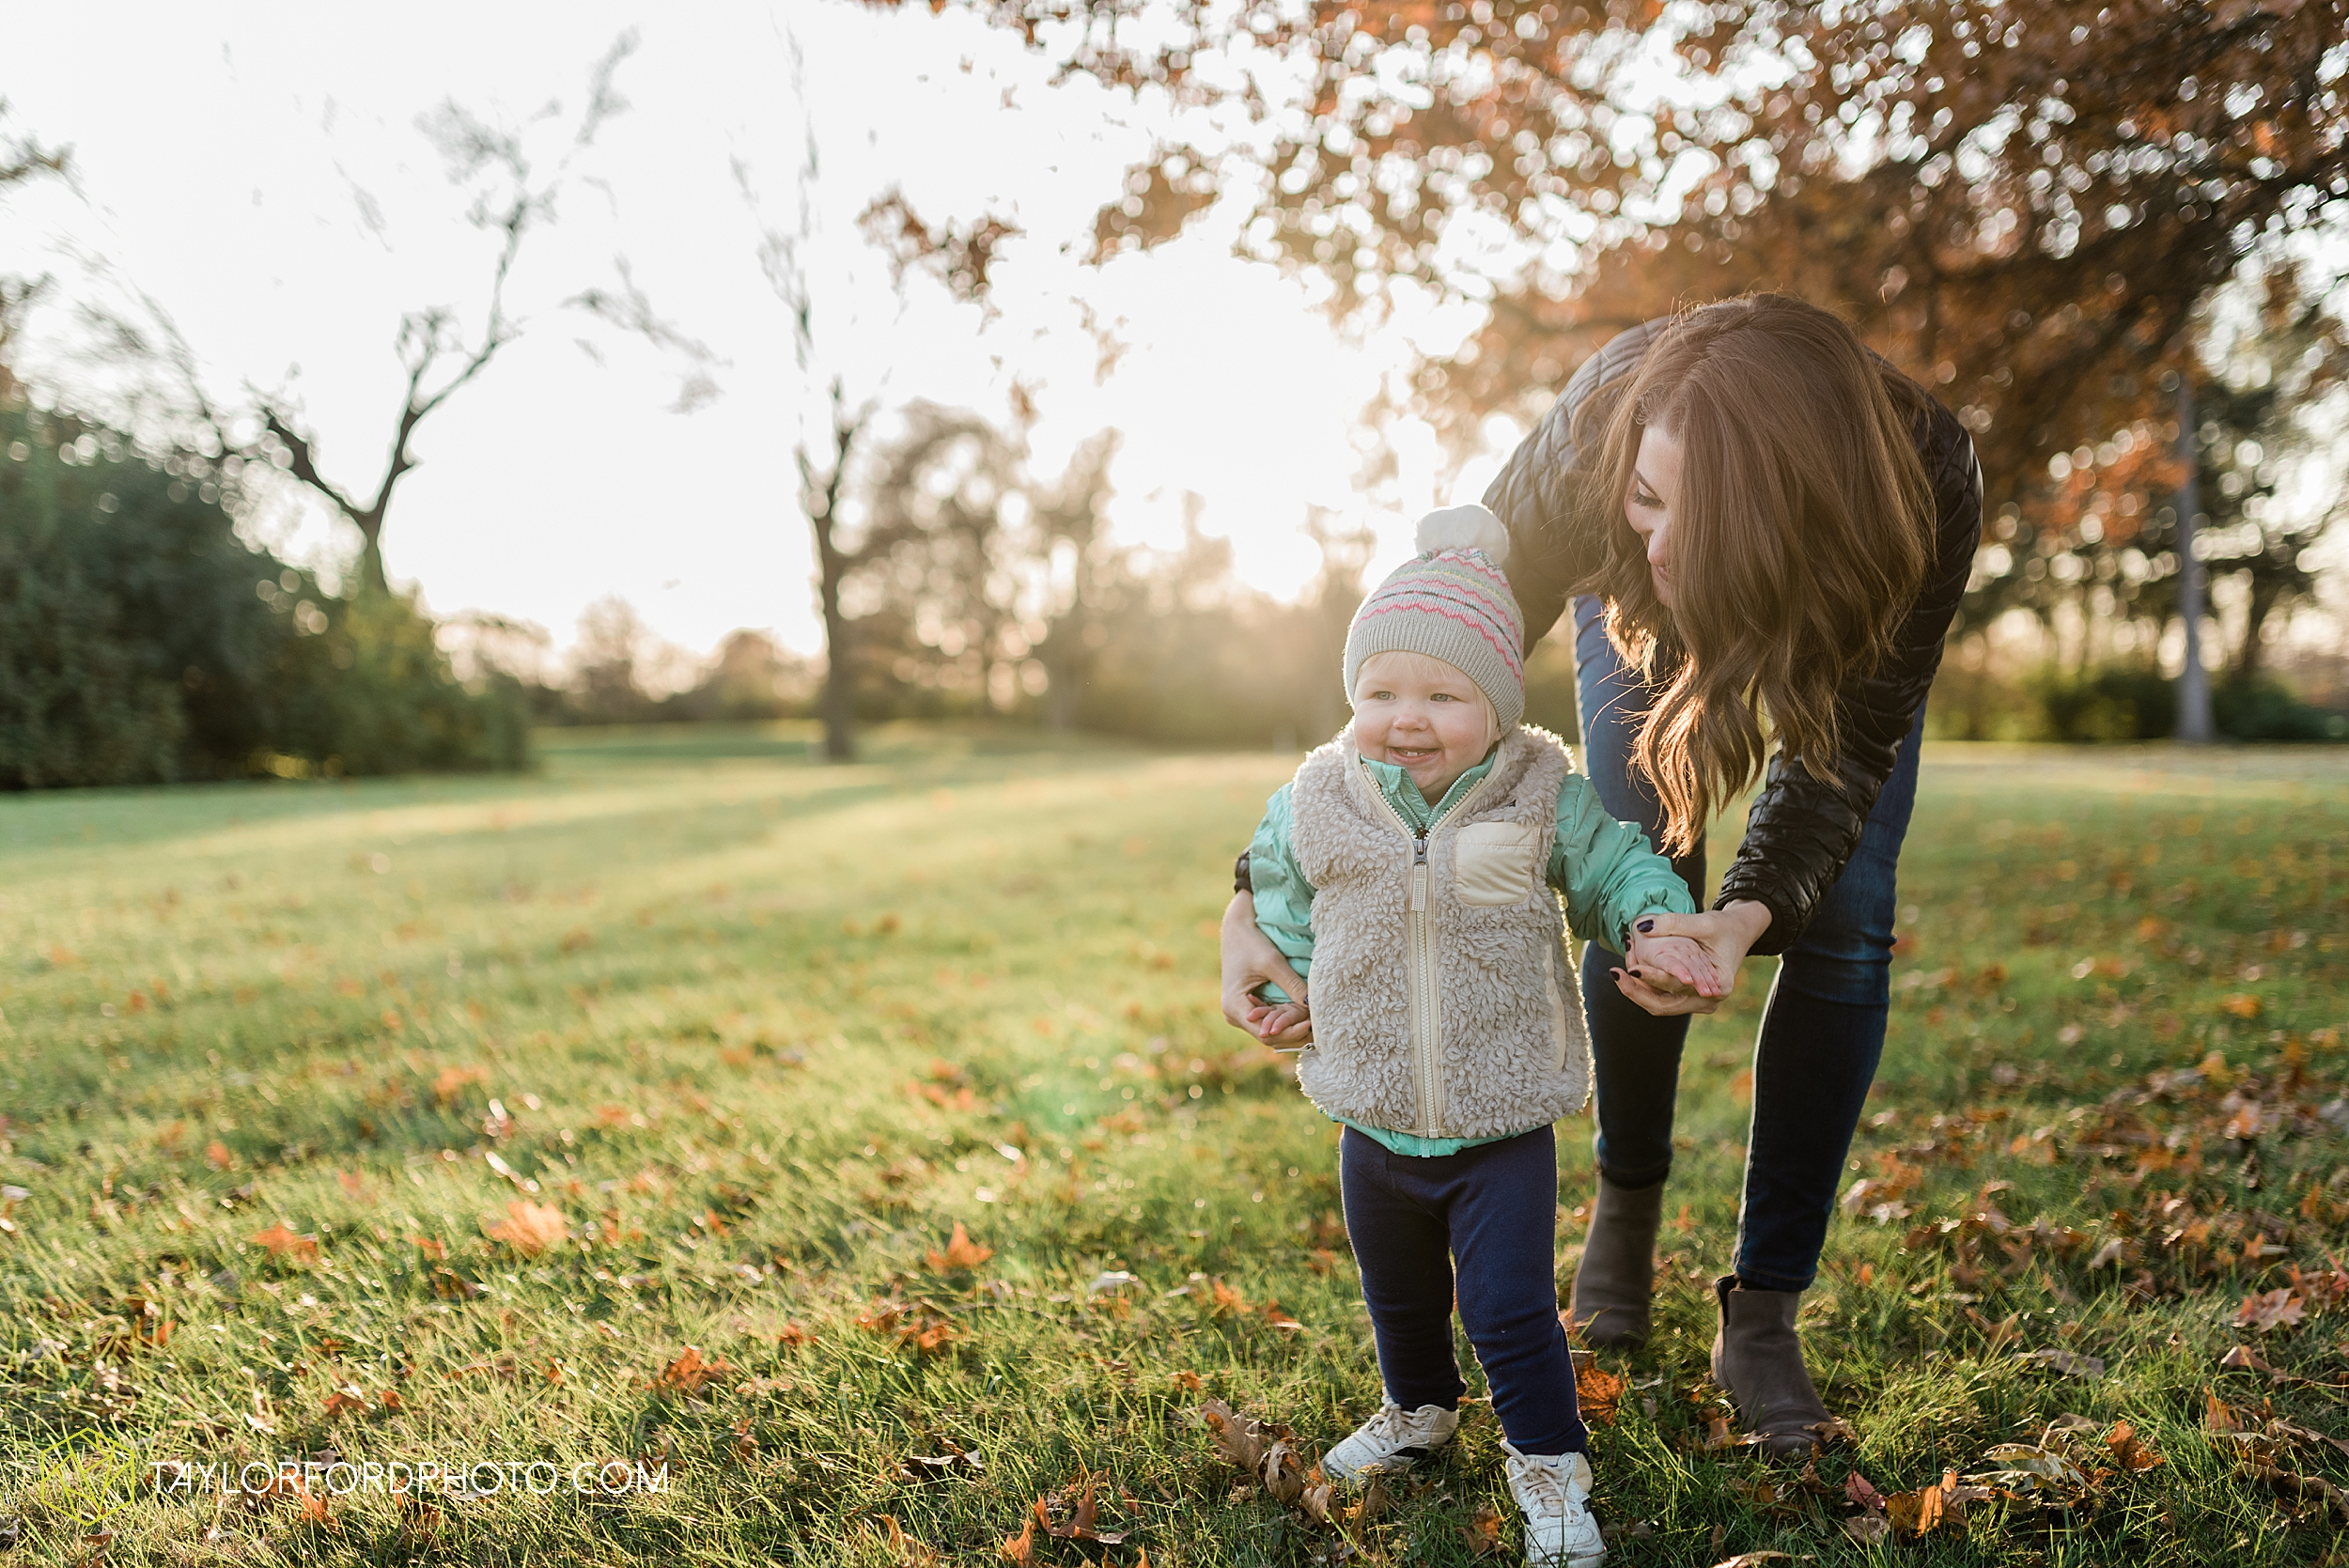 purmort-backyard-van-wert-ohio-fall-family-photographer-taylor-ford-hirschy-photographer_1678.jpg